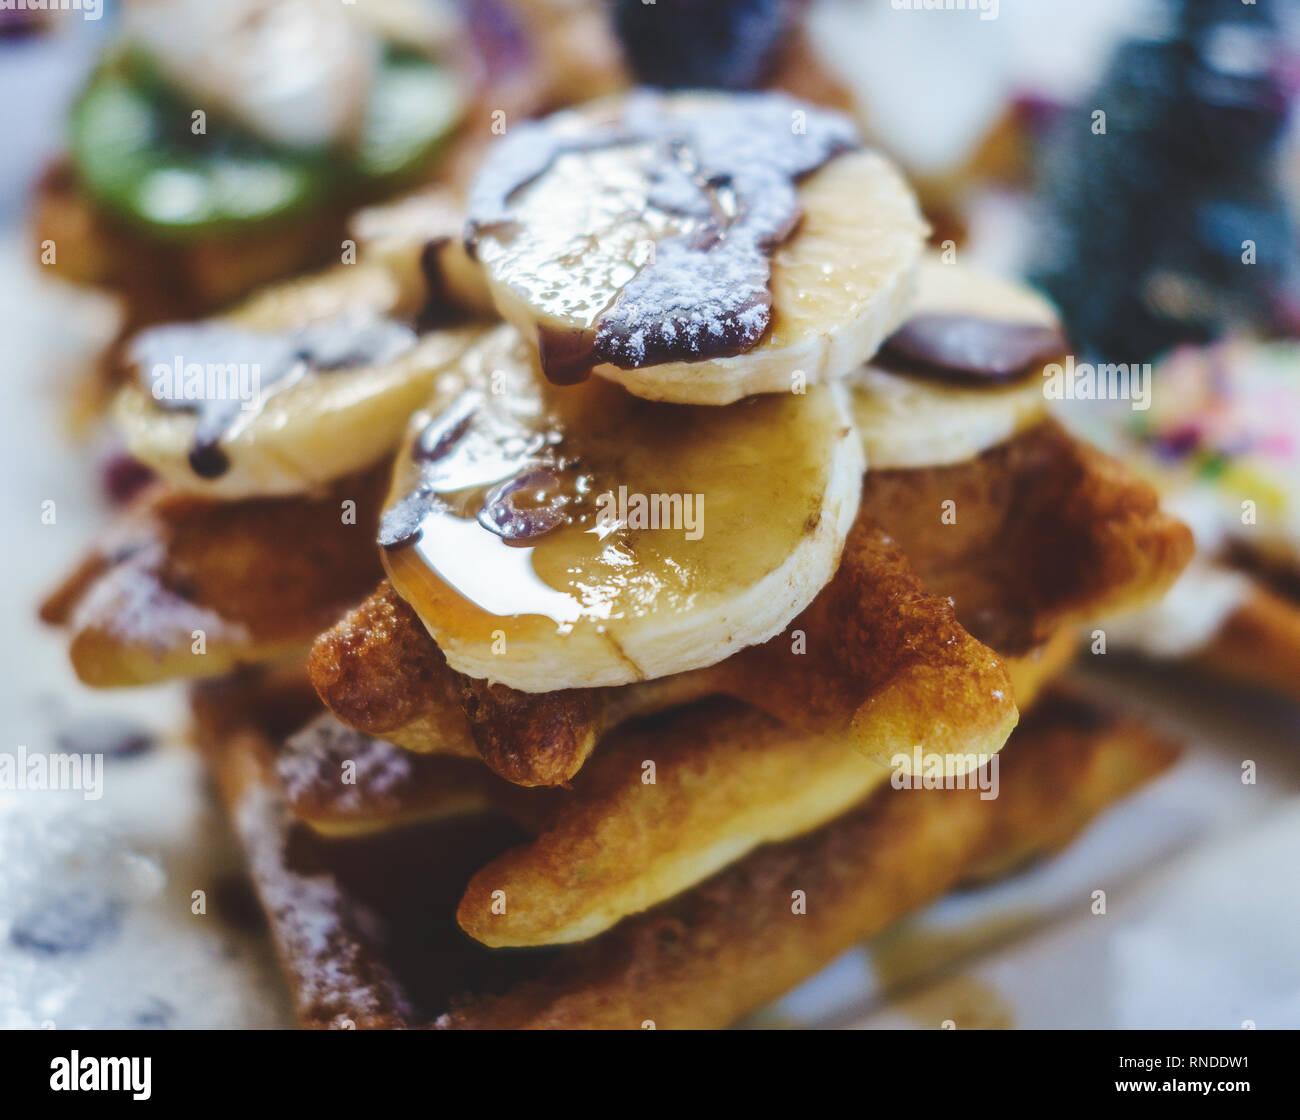 Cloweup of Banana Chocolate Waffles - Stock Image